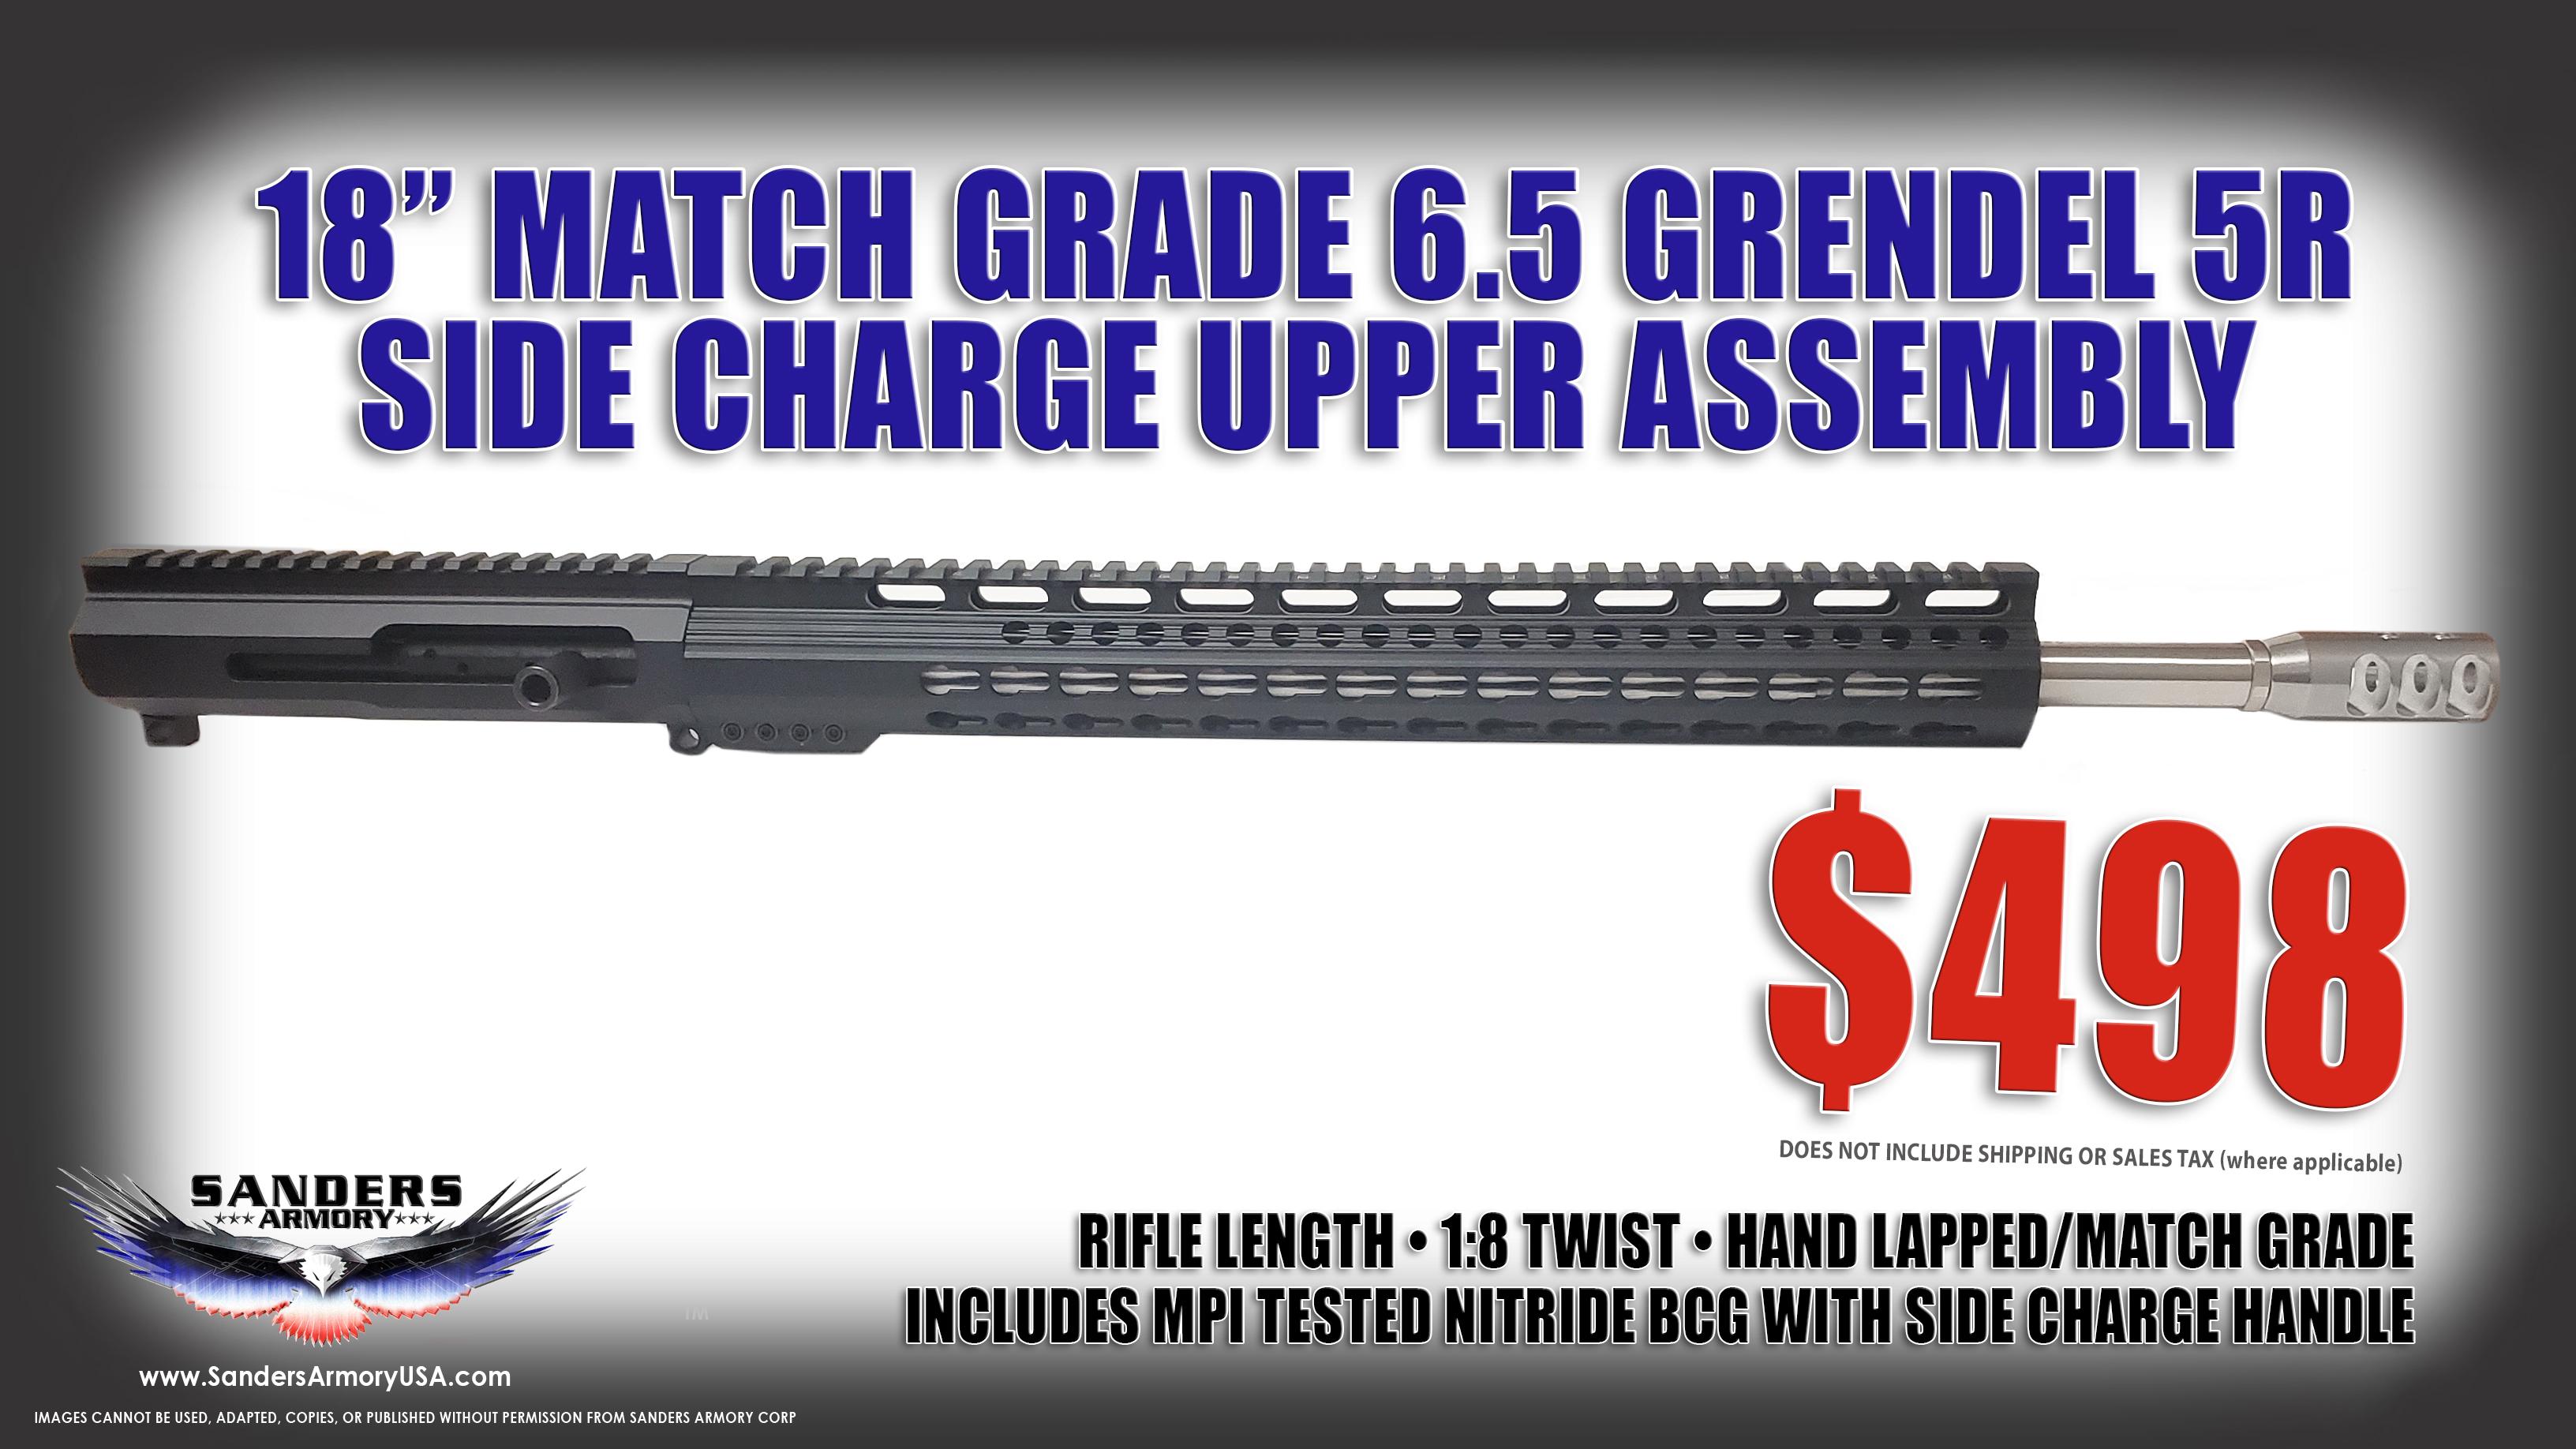 Sanders Armory 18″ Match Grade 6.5 Grendel Type II